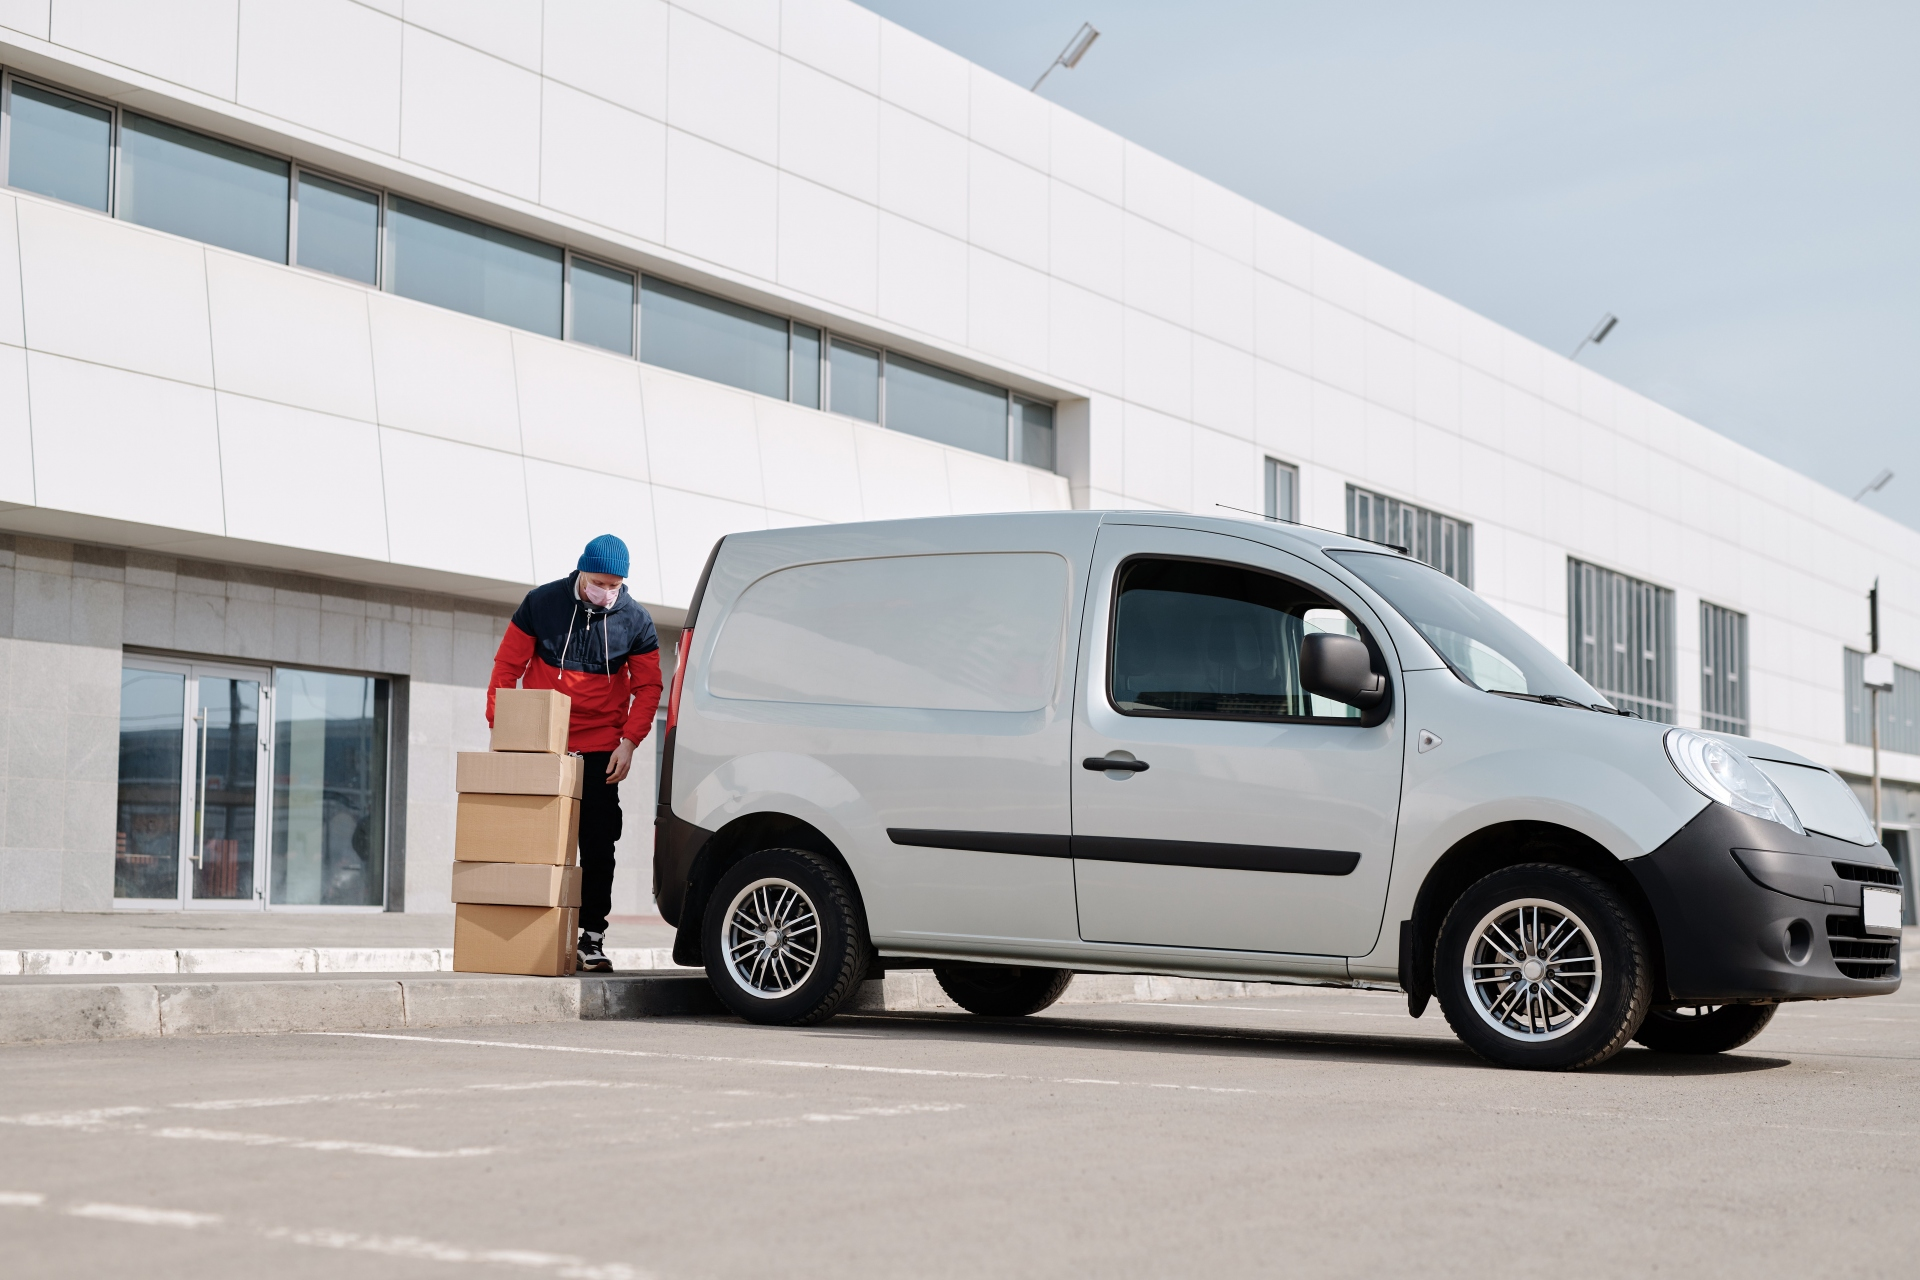 Top Mistakes UK Van Driver Make In Renewing Vehicle Insurance